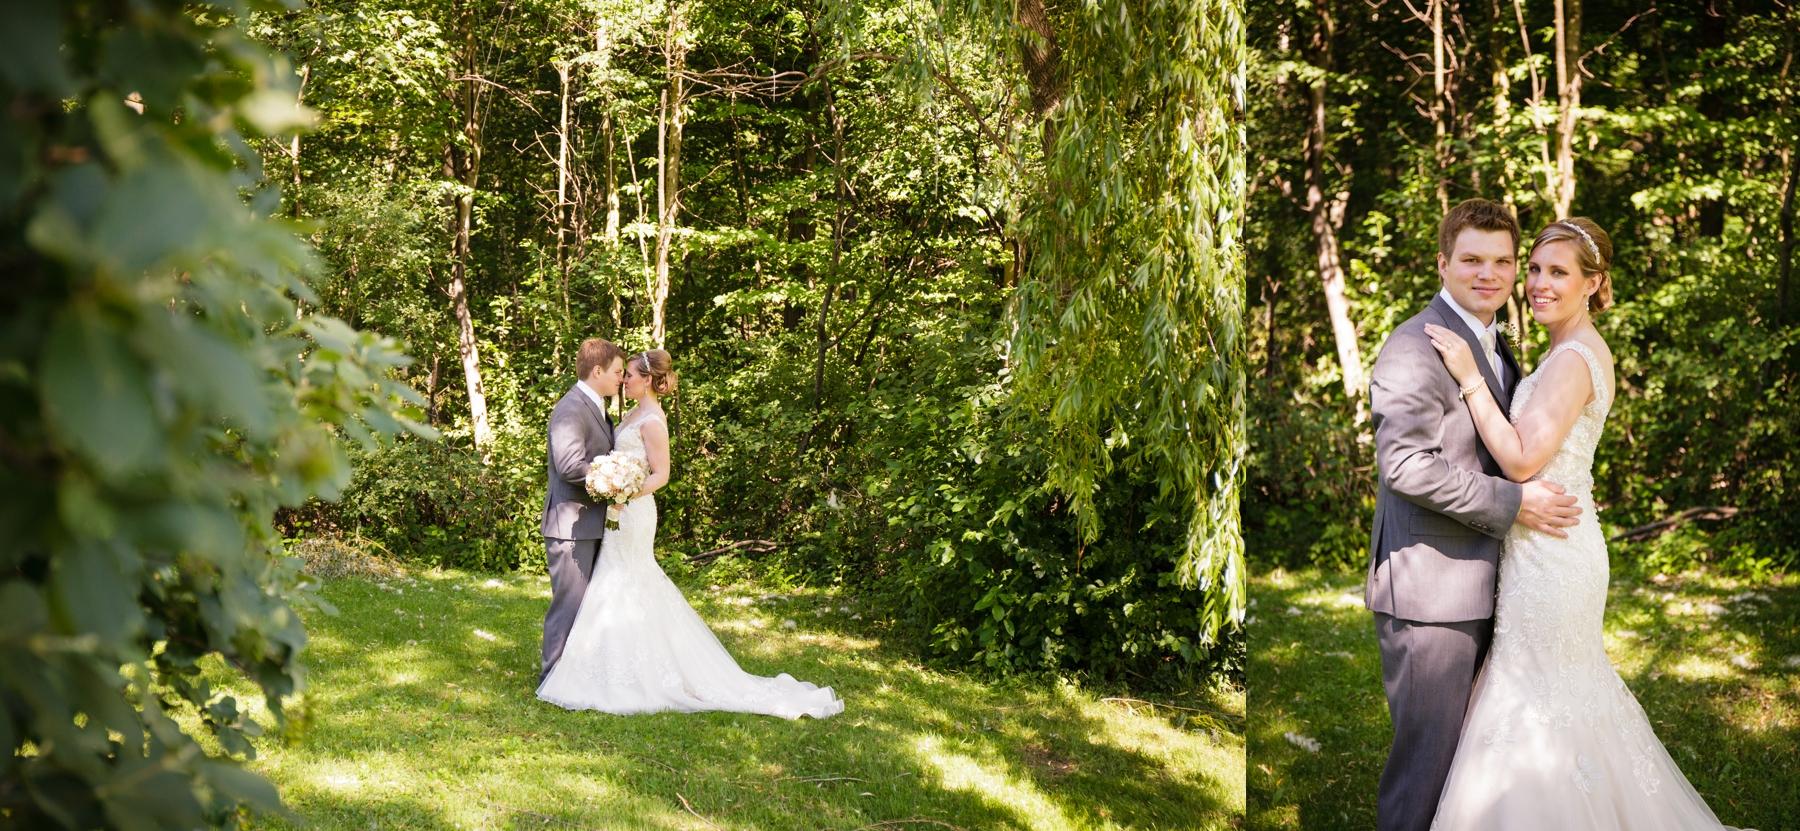 Ben_Jillian_Midland_Baycity_Wedding_0050.jpg